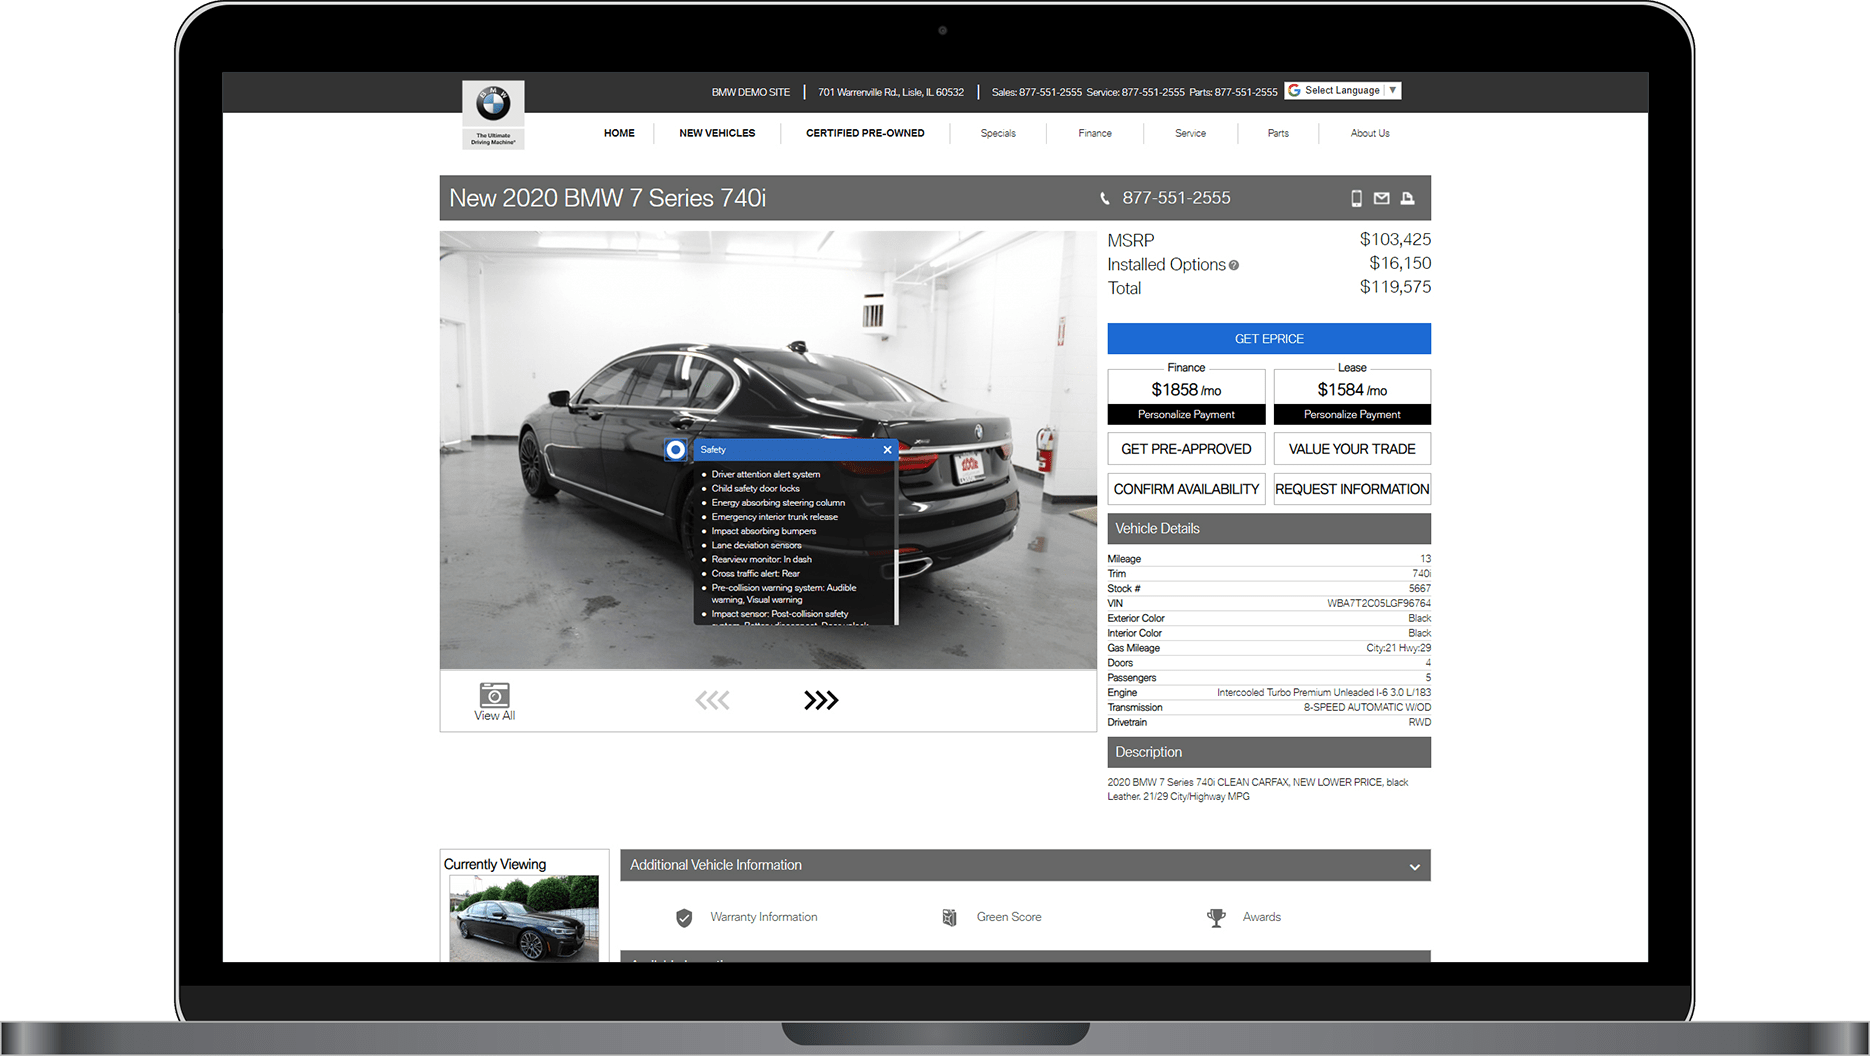 VDP on BMW website